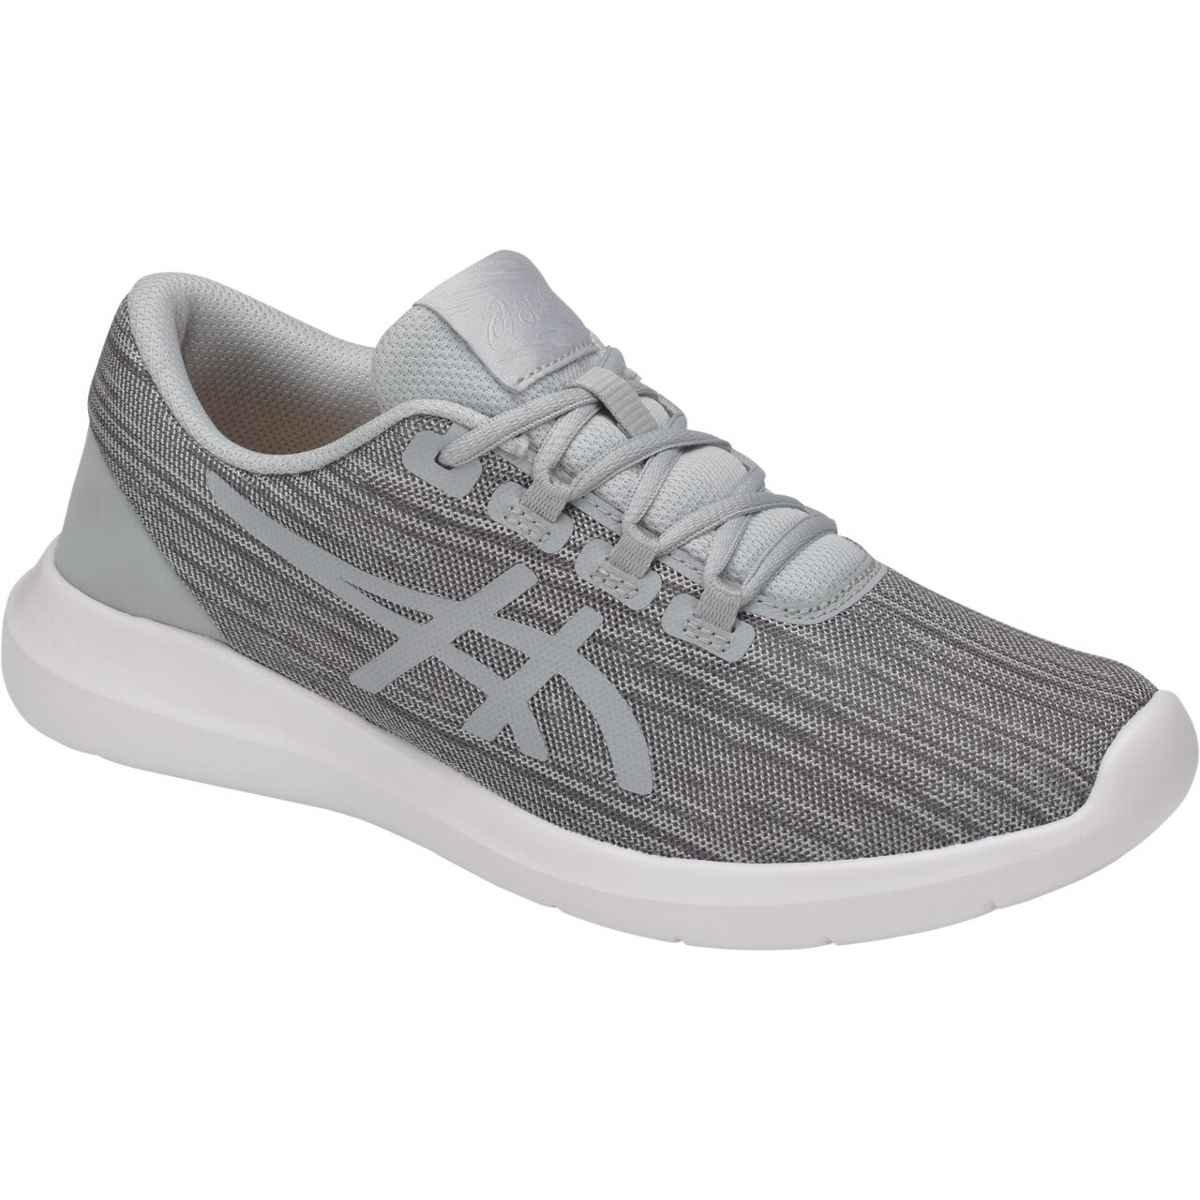 ASICS Metrolyte US|Mid II Shoe Women's Walking B0719F4S8R 7.5 M US|Mid Metrolyte Grey/Mid Grey/Apricote Ice f7991e